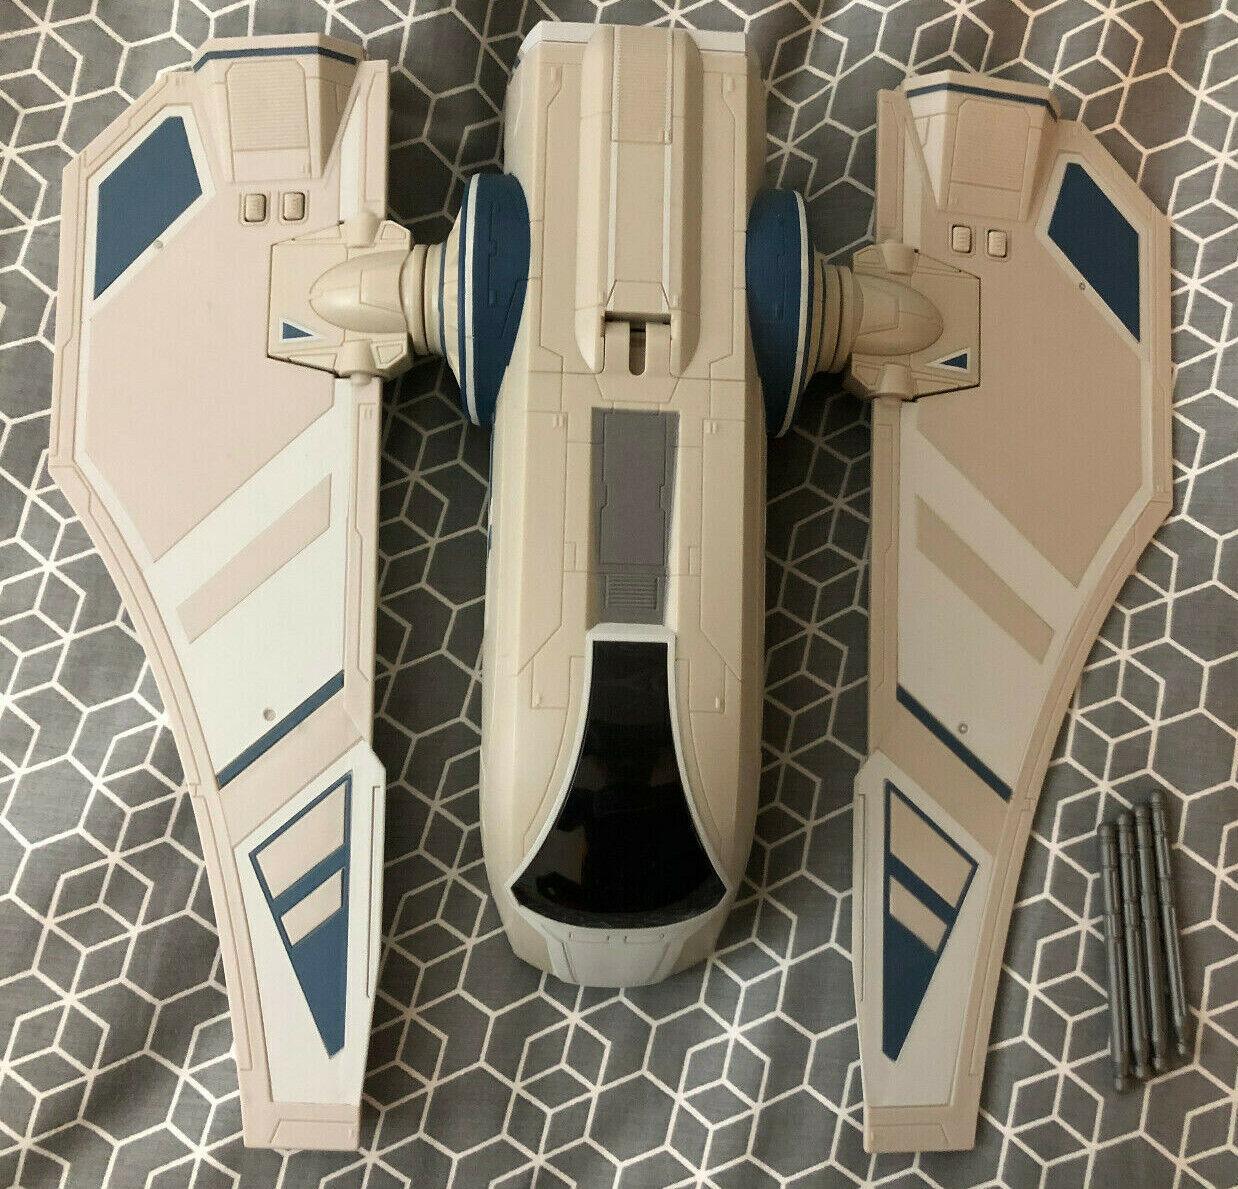 Star Wars Hasbro The Clone Clone Clone Wars TCW Mandalorian Assault Transport Vehicle Ship 4a9a0a